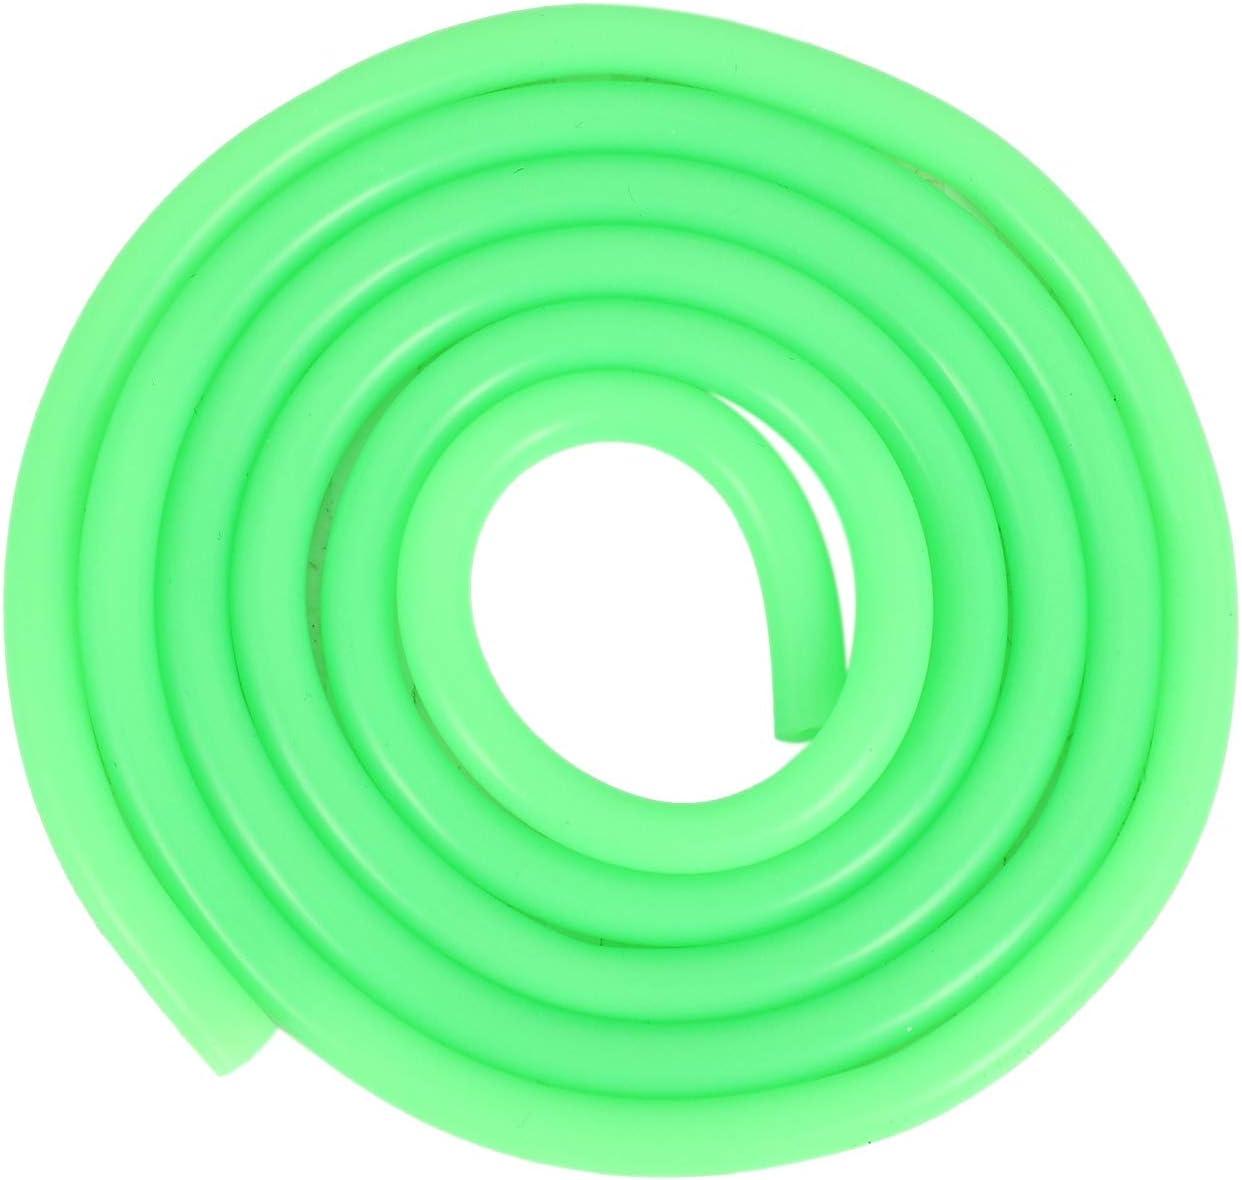 Gaetooely 100CM RC Manguera de Gasolina de Combustible de Autom/óVil Manguera de Silicona para 1//10 1//18 Accesorios para Riel de Cami/óN Verde